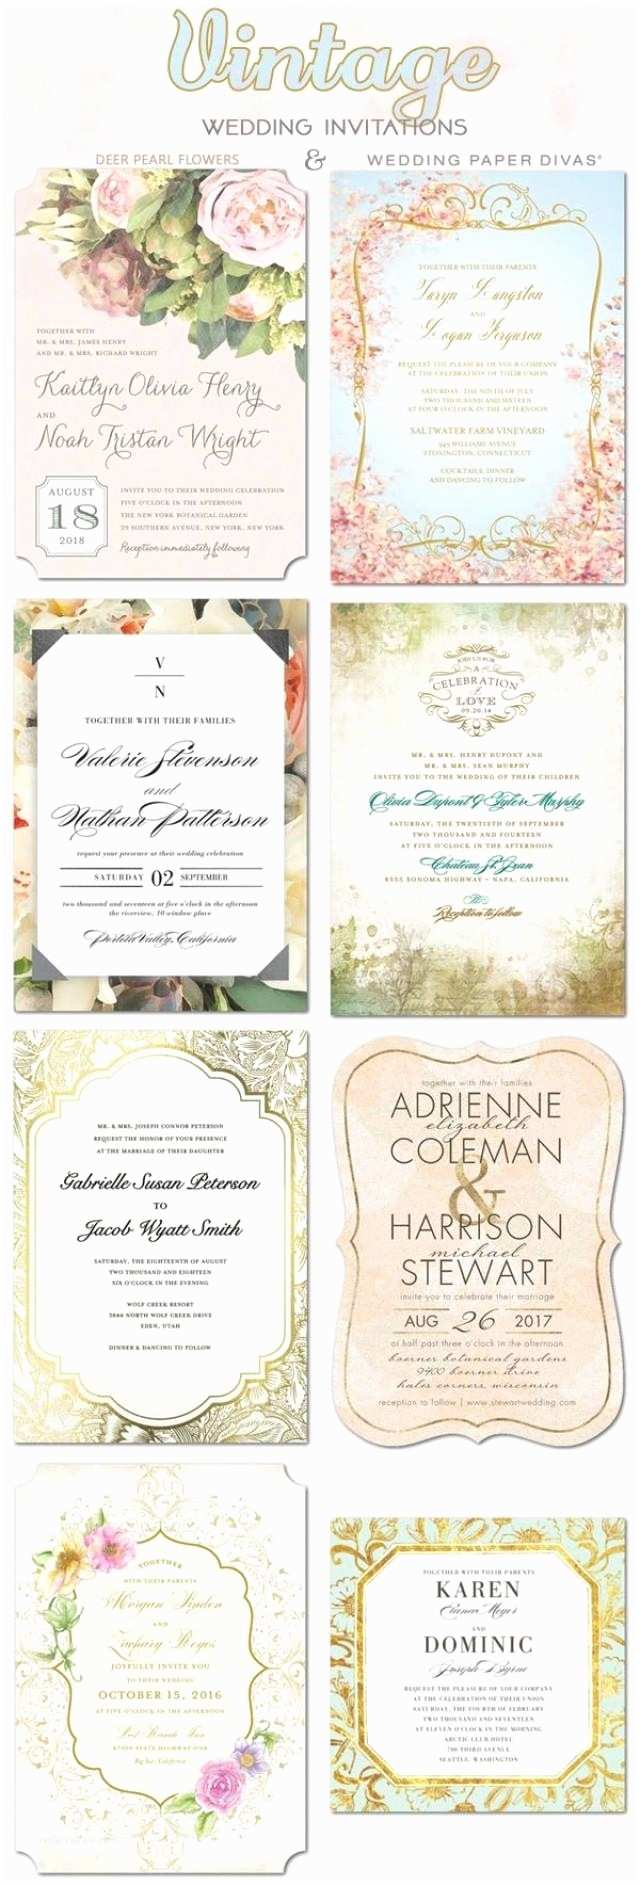 Wedding Divas Wedding Invitations top 8 themed Wedding Paper Divas Wedding Invitations